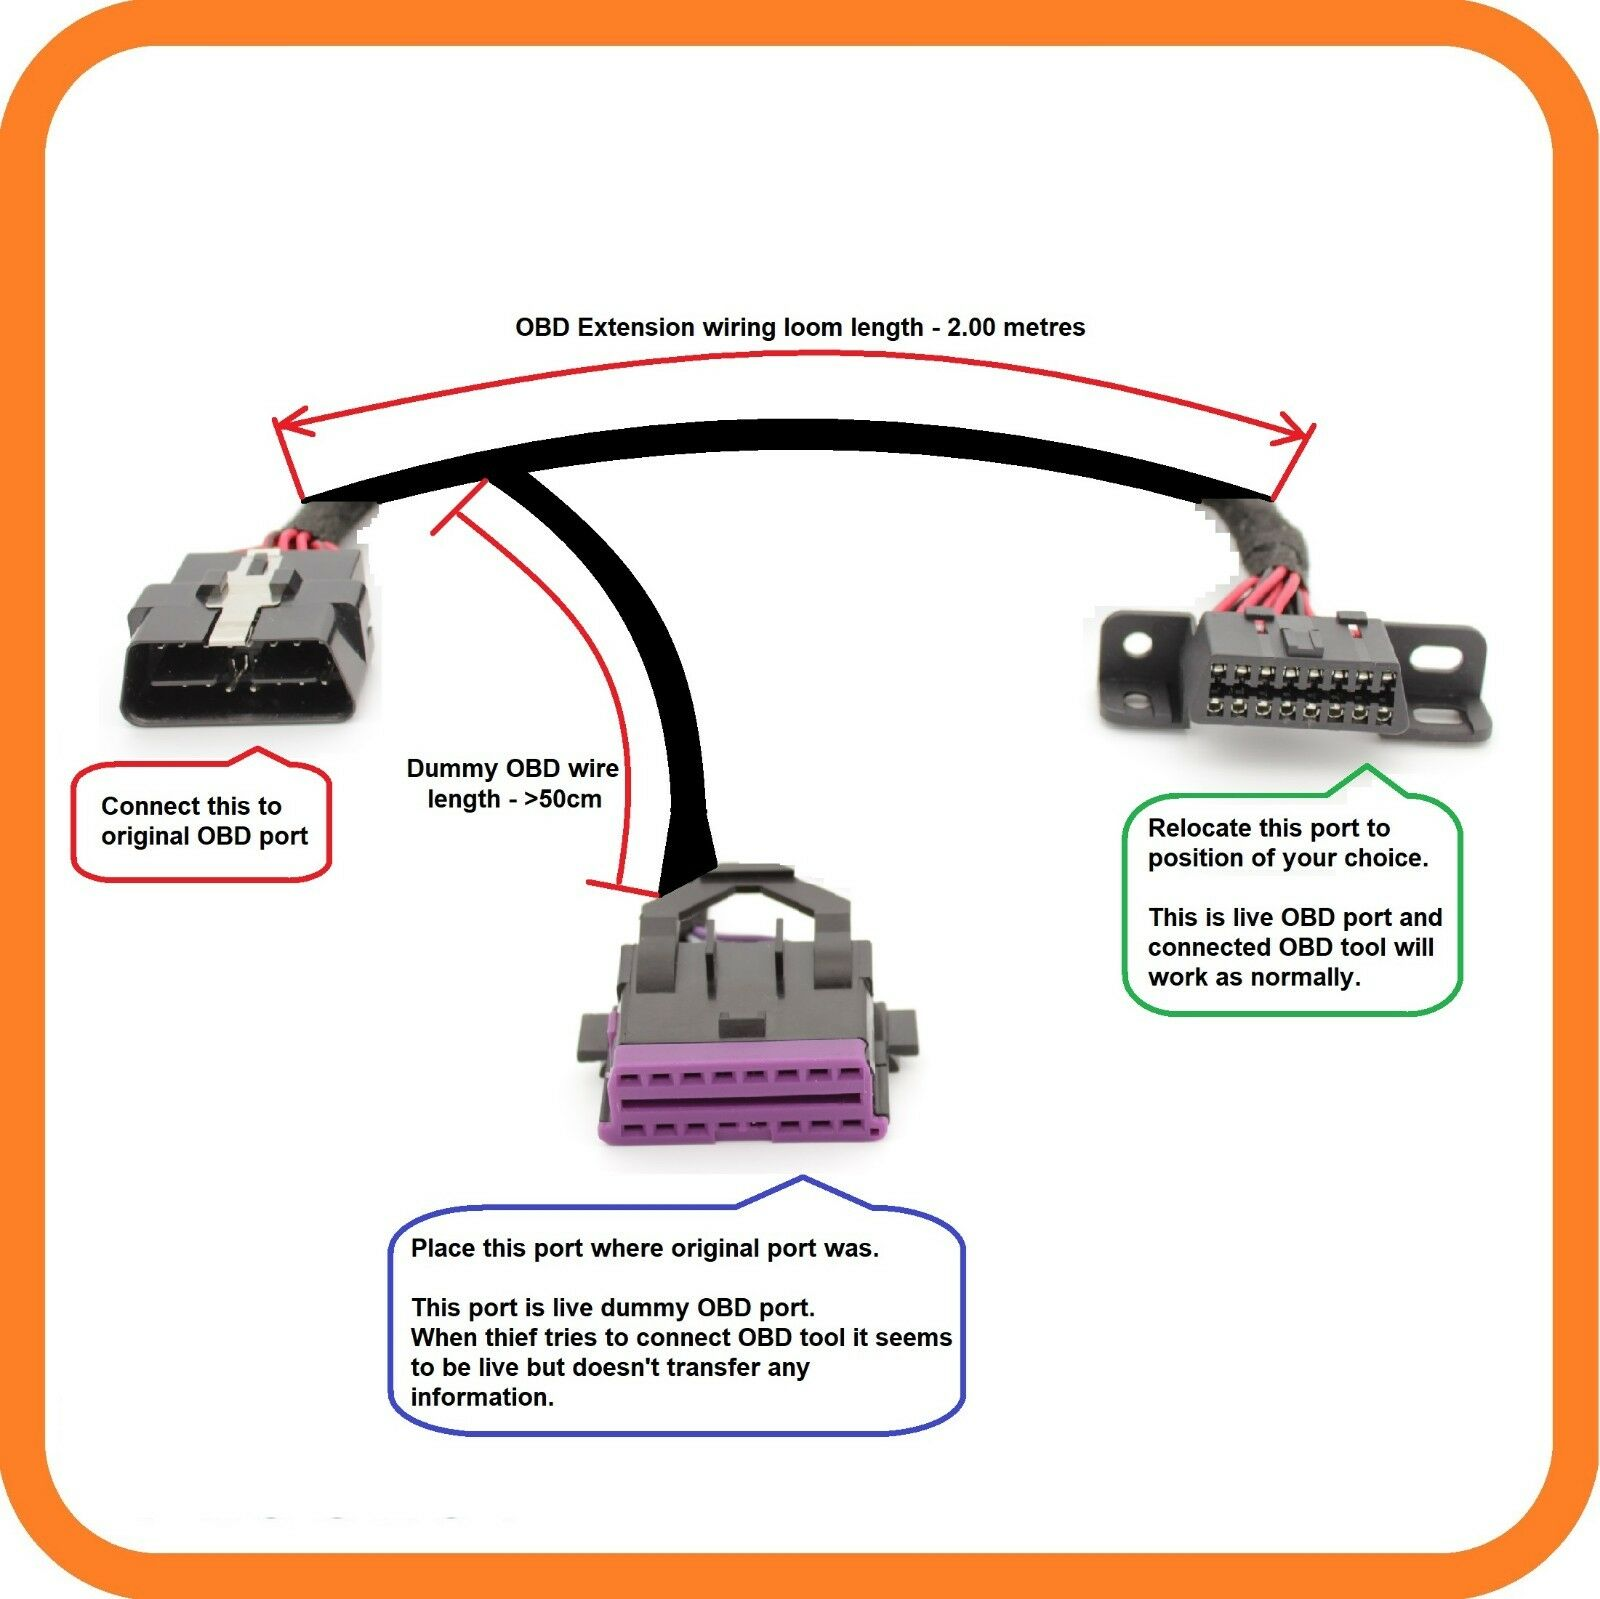 hight resolution of dummy obd port relocation land rover all models dummy obd obd2 port relocate wiring loom